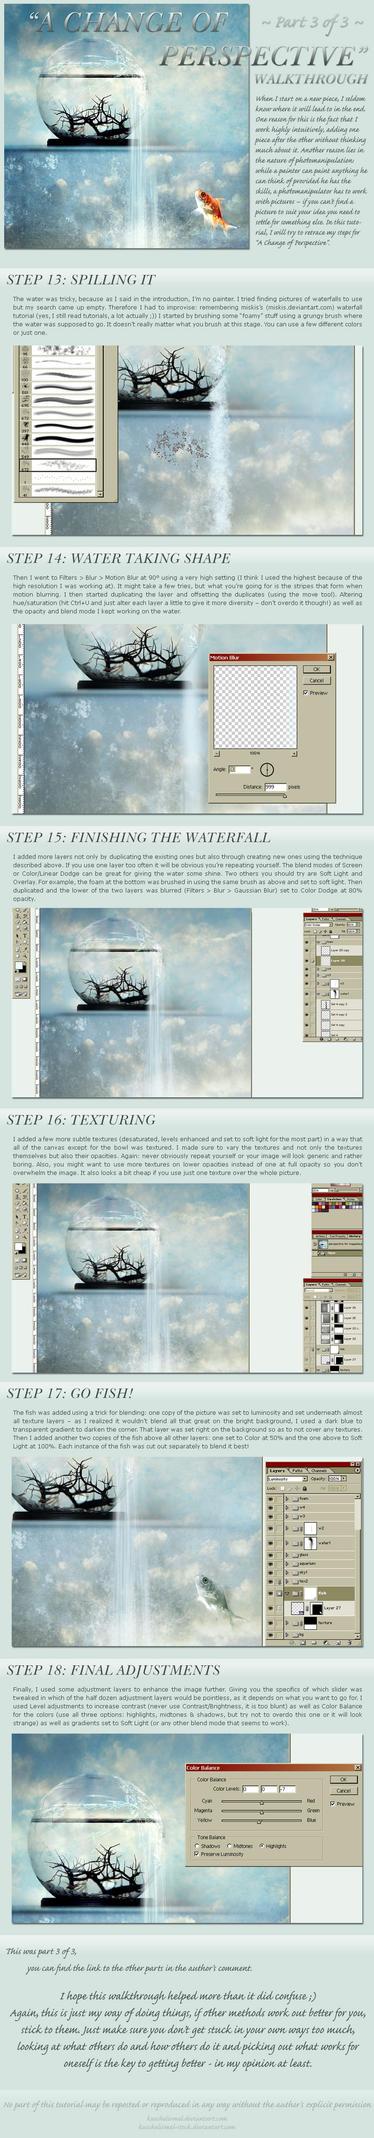 Walkthrough 'Perspective' 3 by kuschelirmel-stock